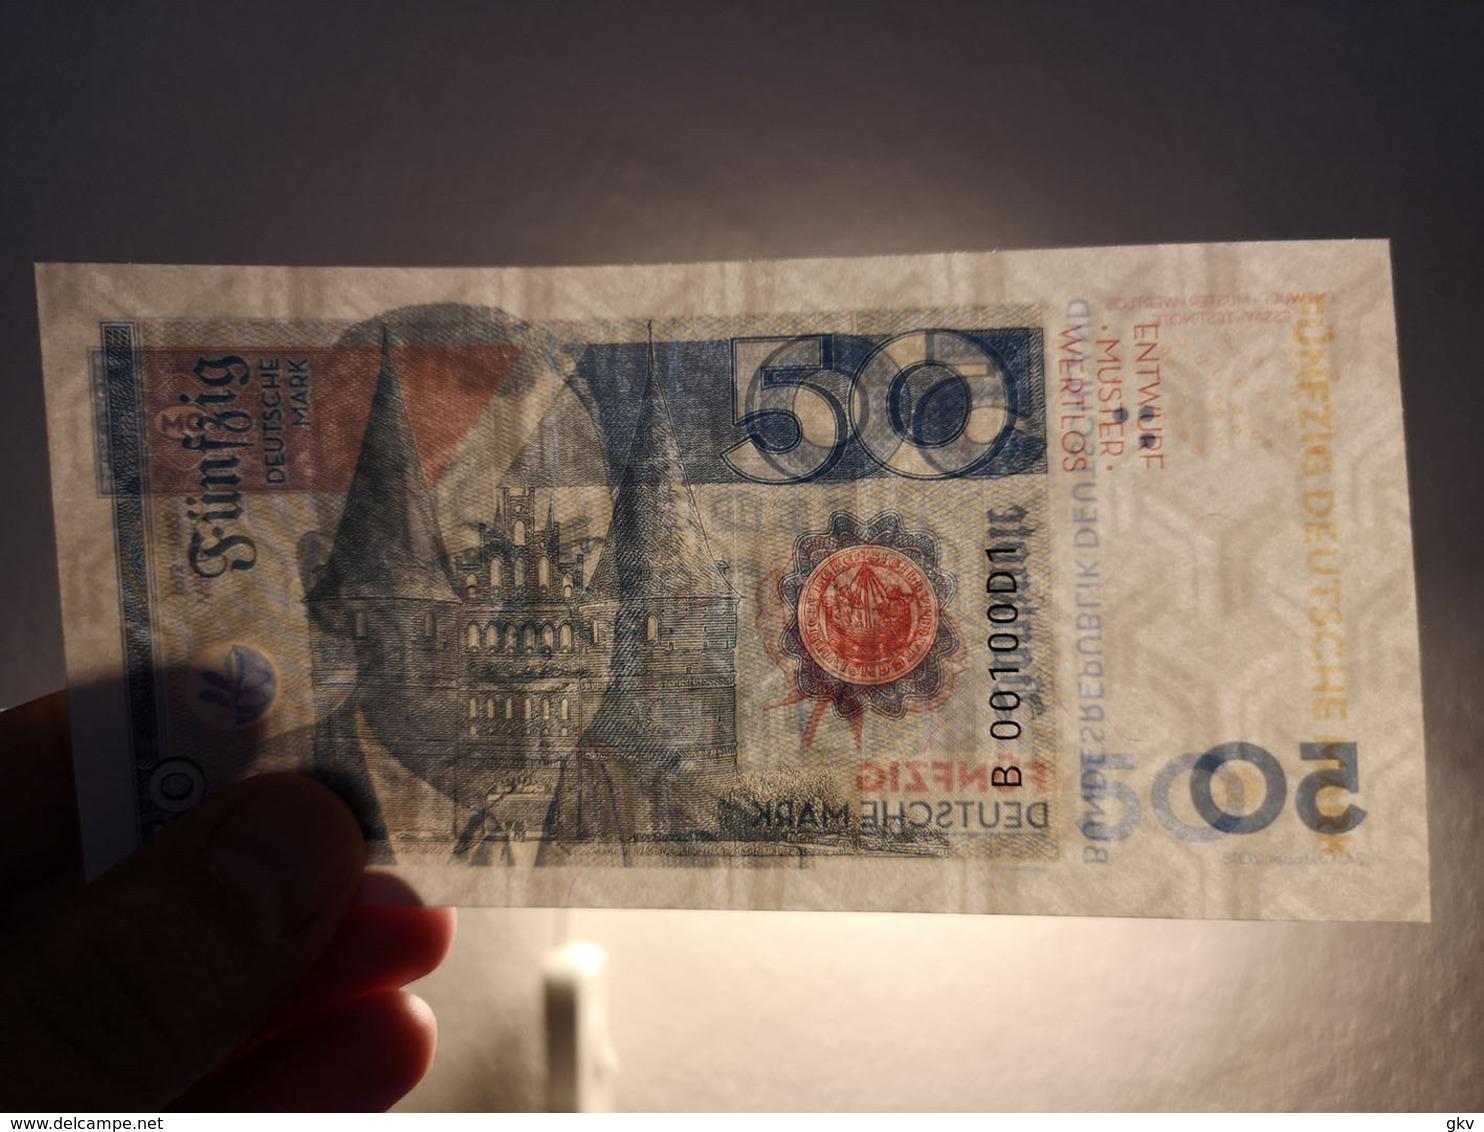 GERMANY 50 Mark 2018 UNC. Willy Brandt. Private Essay. Specimen. - Billets